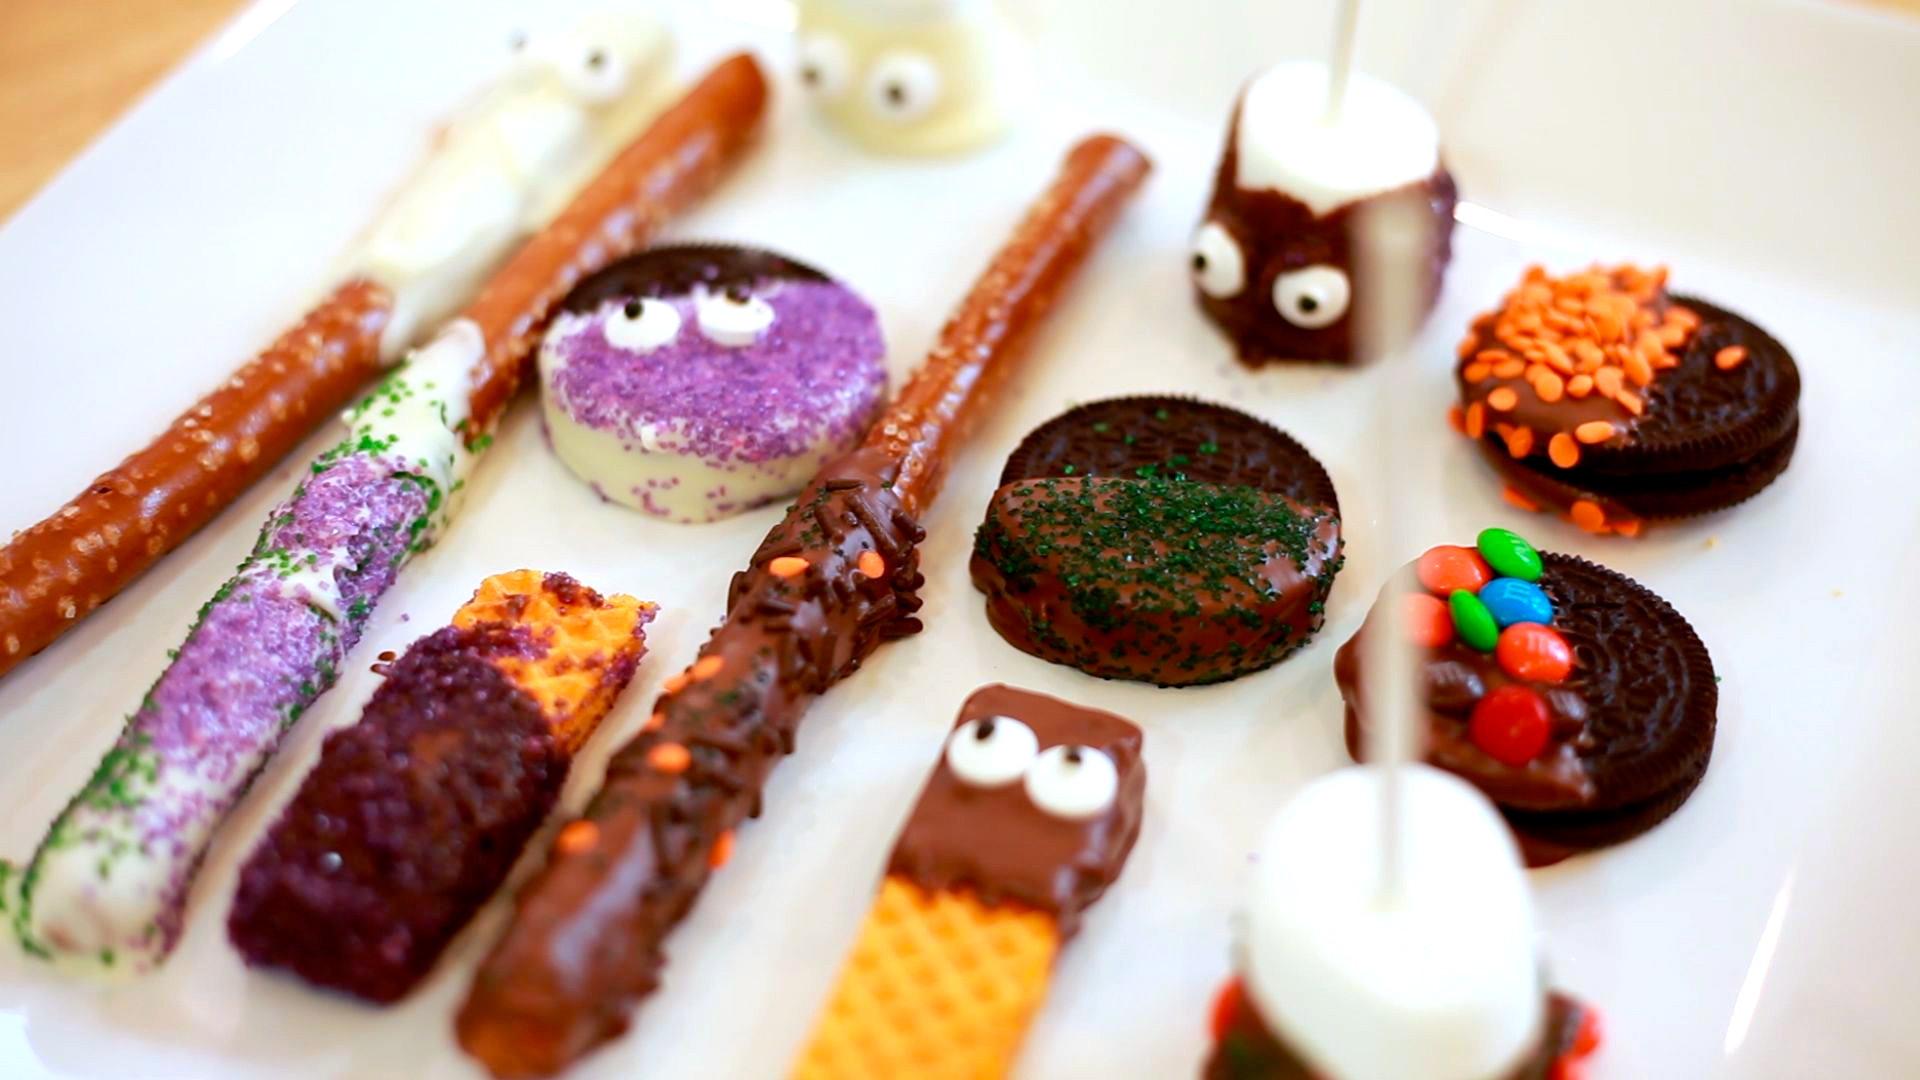 Pinterest Halloween Desserts  5 Pinterest Desserts Tested Halloween Edition